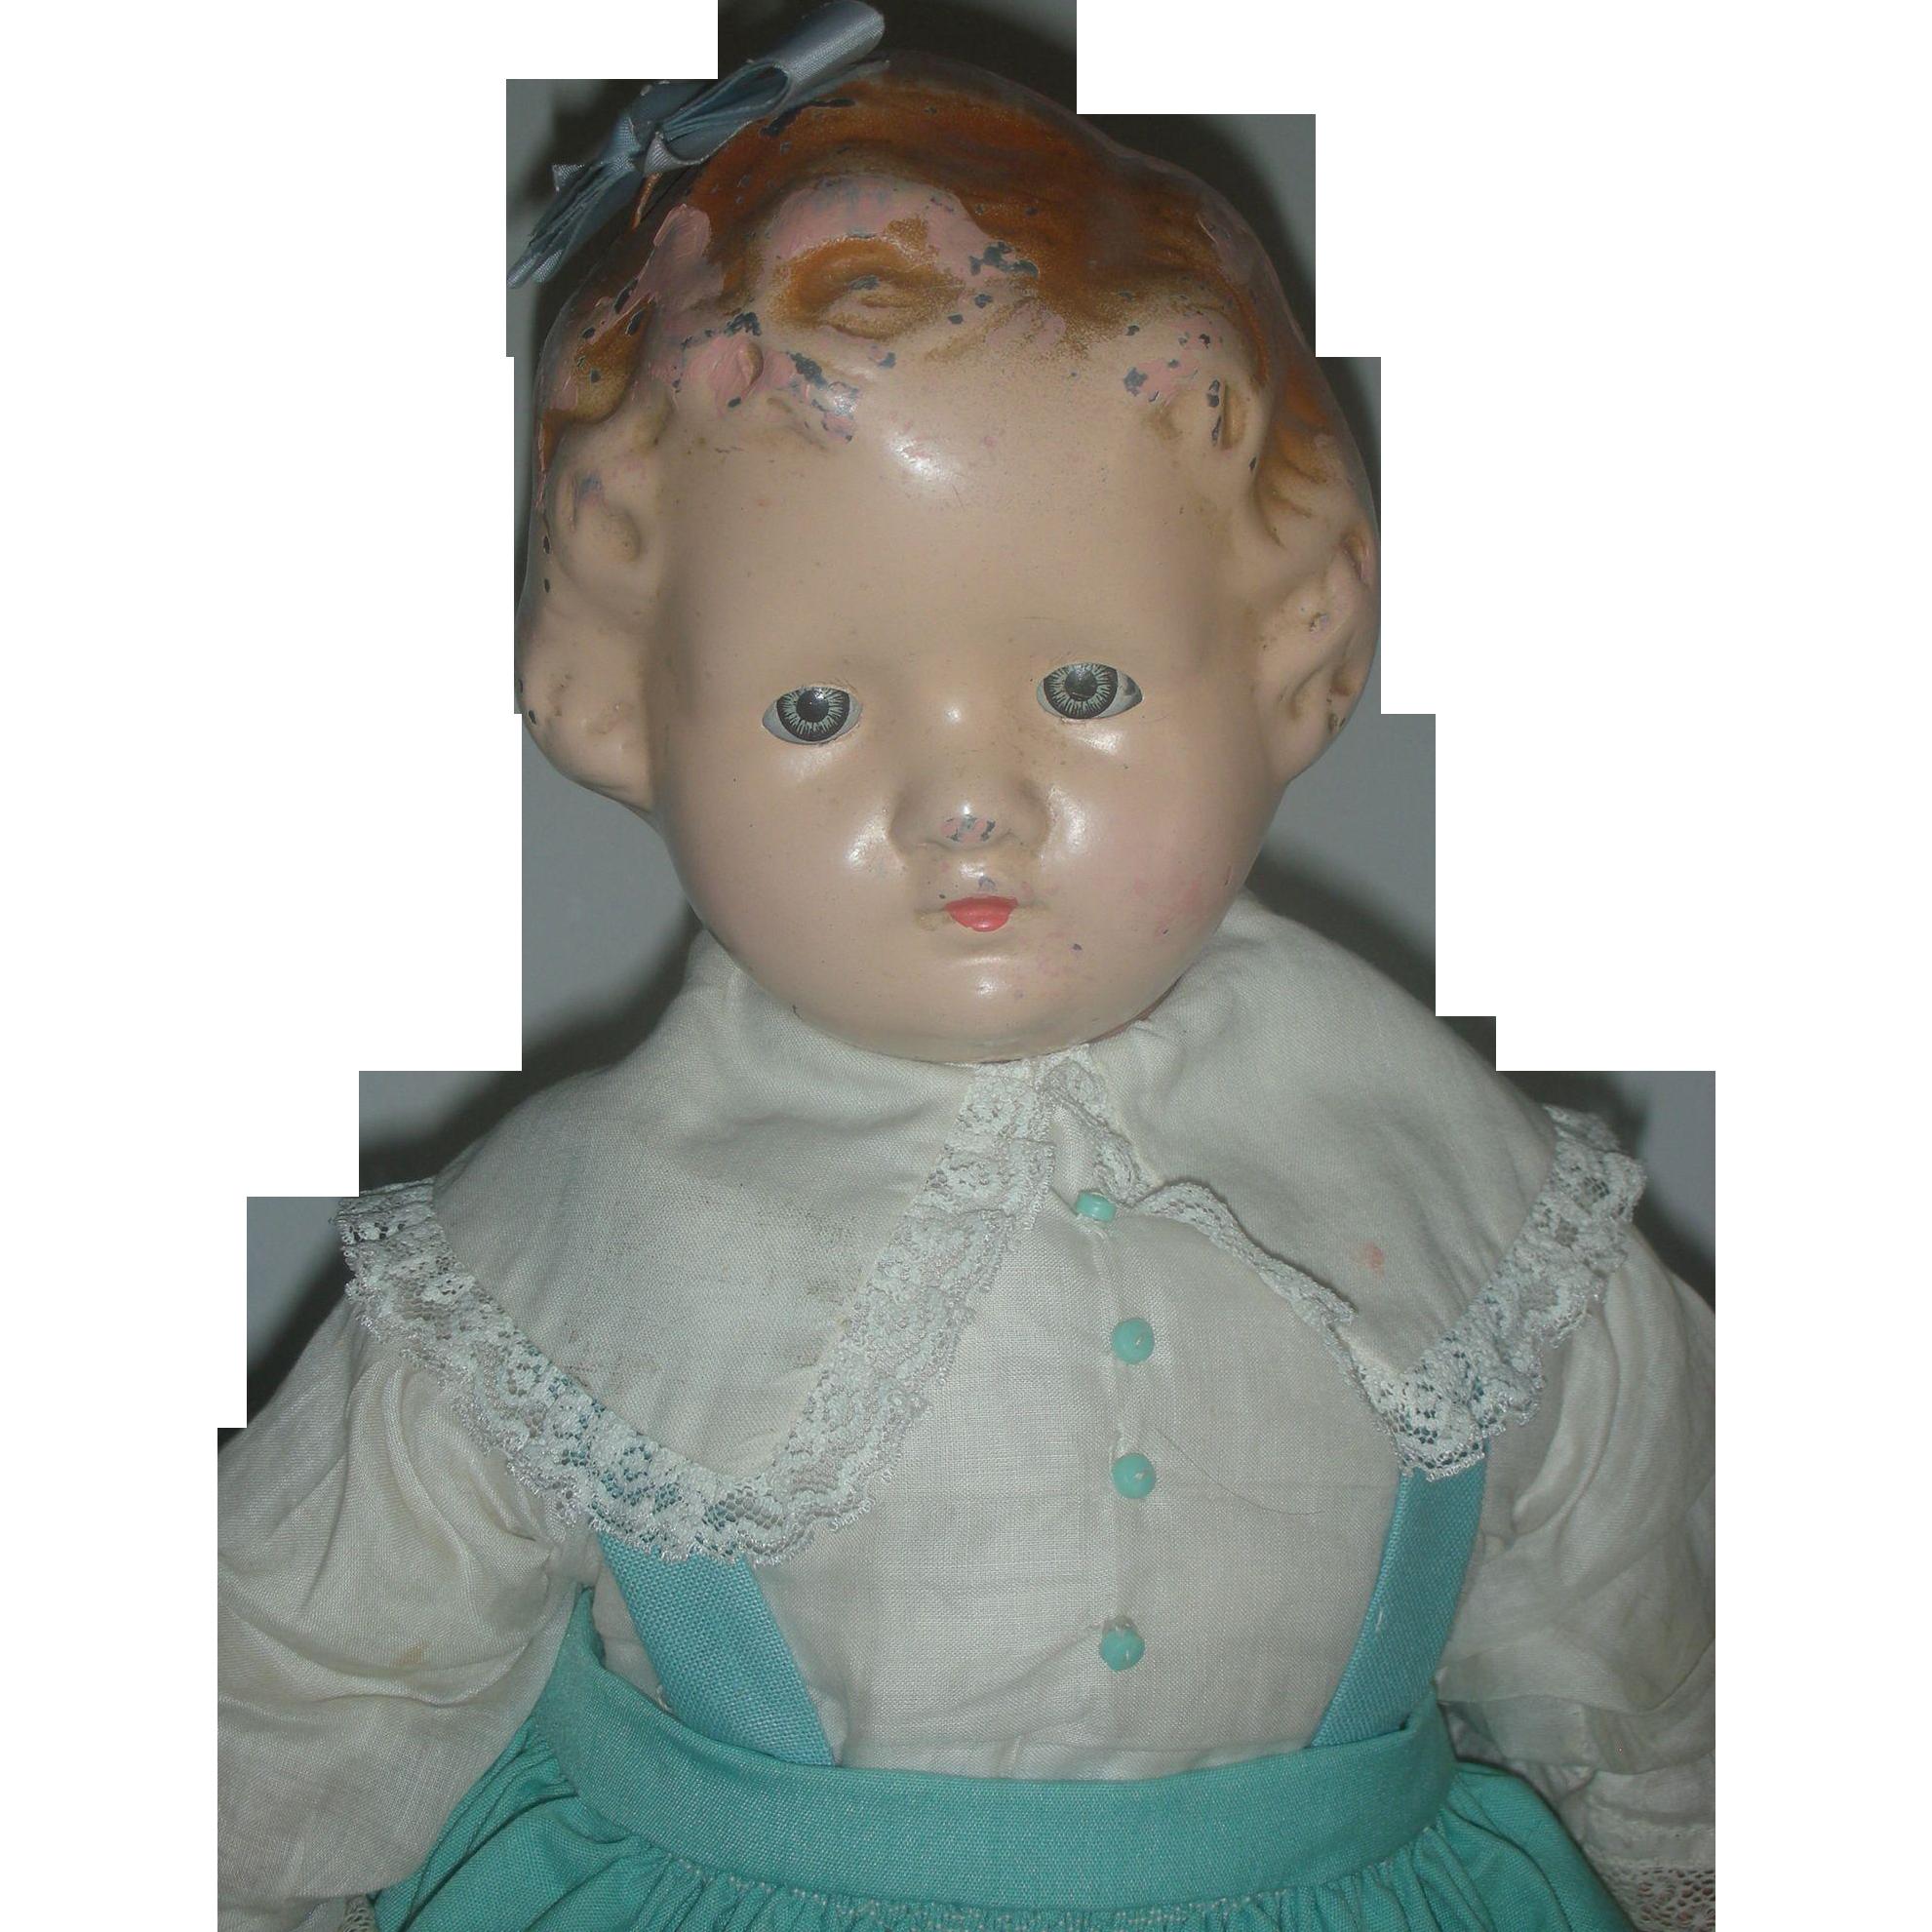 Rare Tin or Metal Hea Loop Hair Doll Compostion Arms and Legs an Sleep Eyes